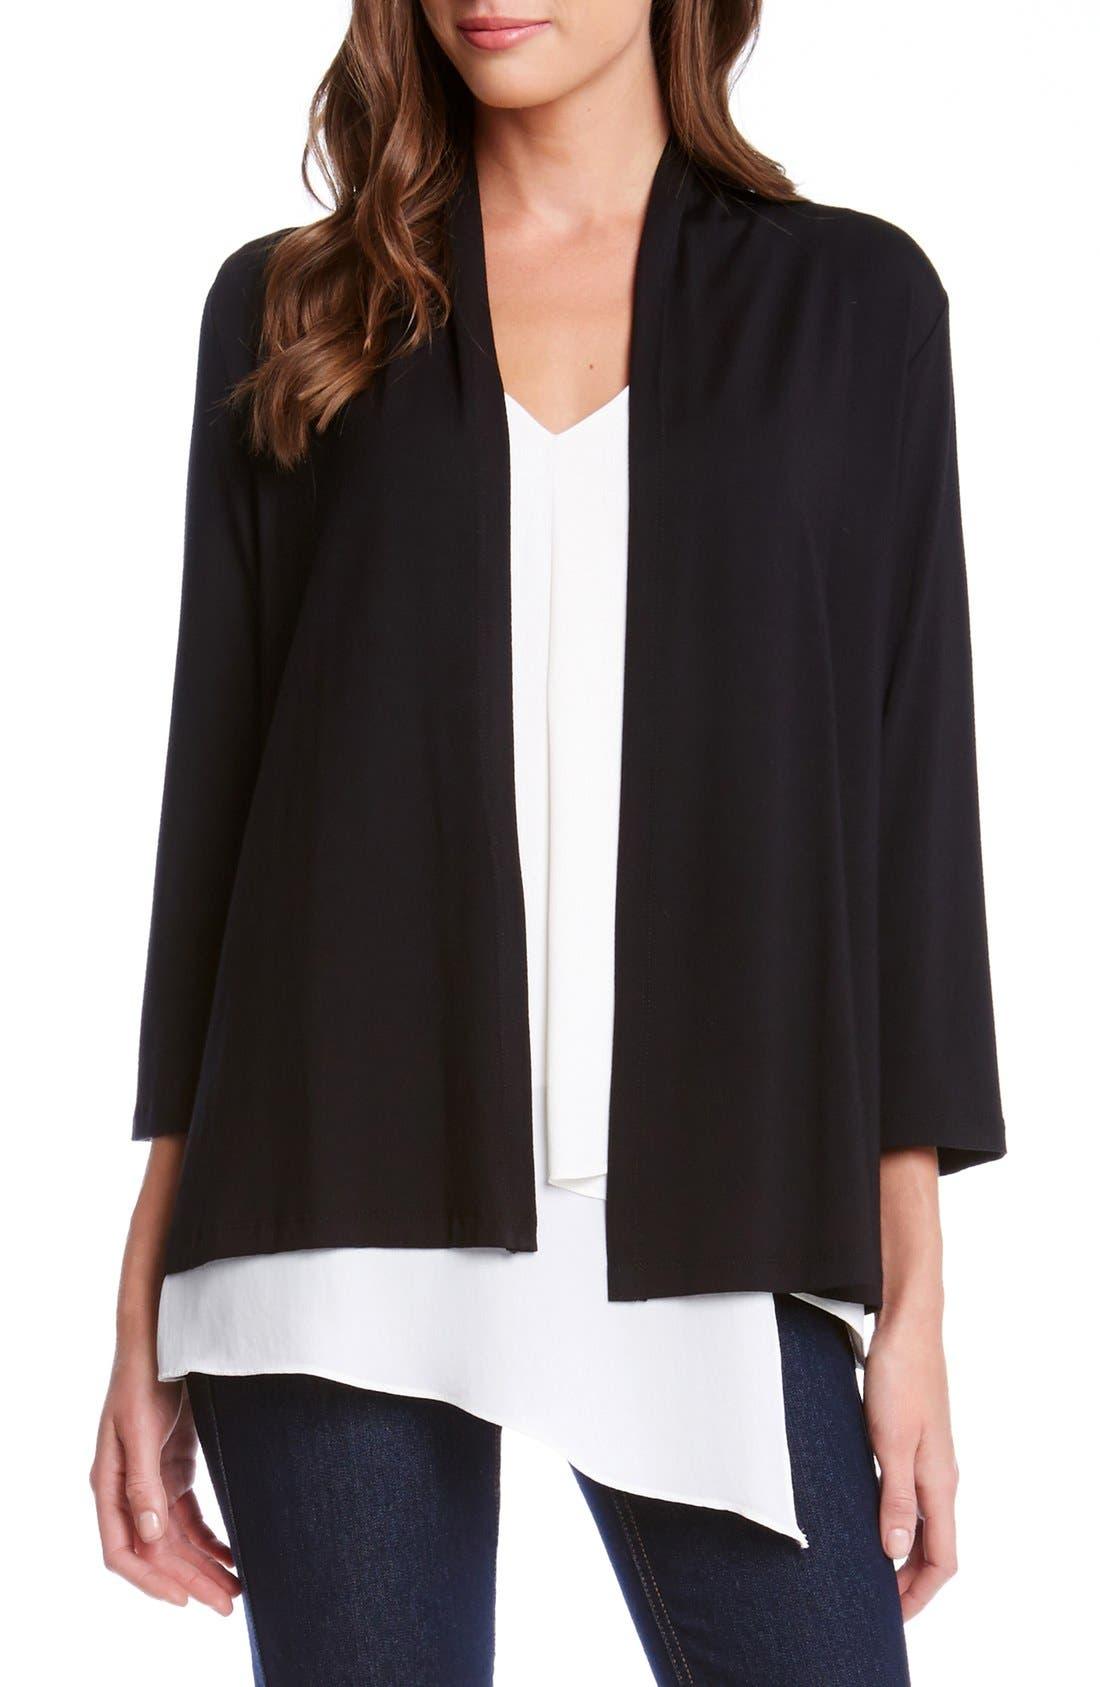 KAREN KANE 'Molly' Open Jersey Cardigan, Main, color, BLACK